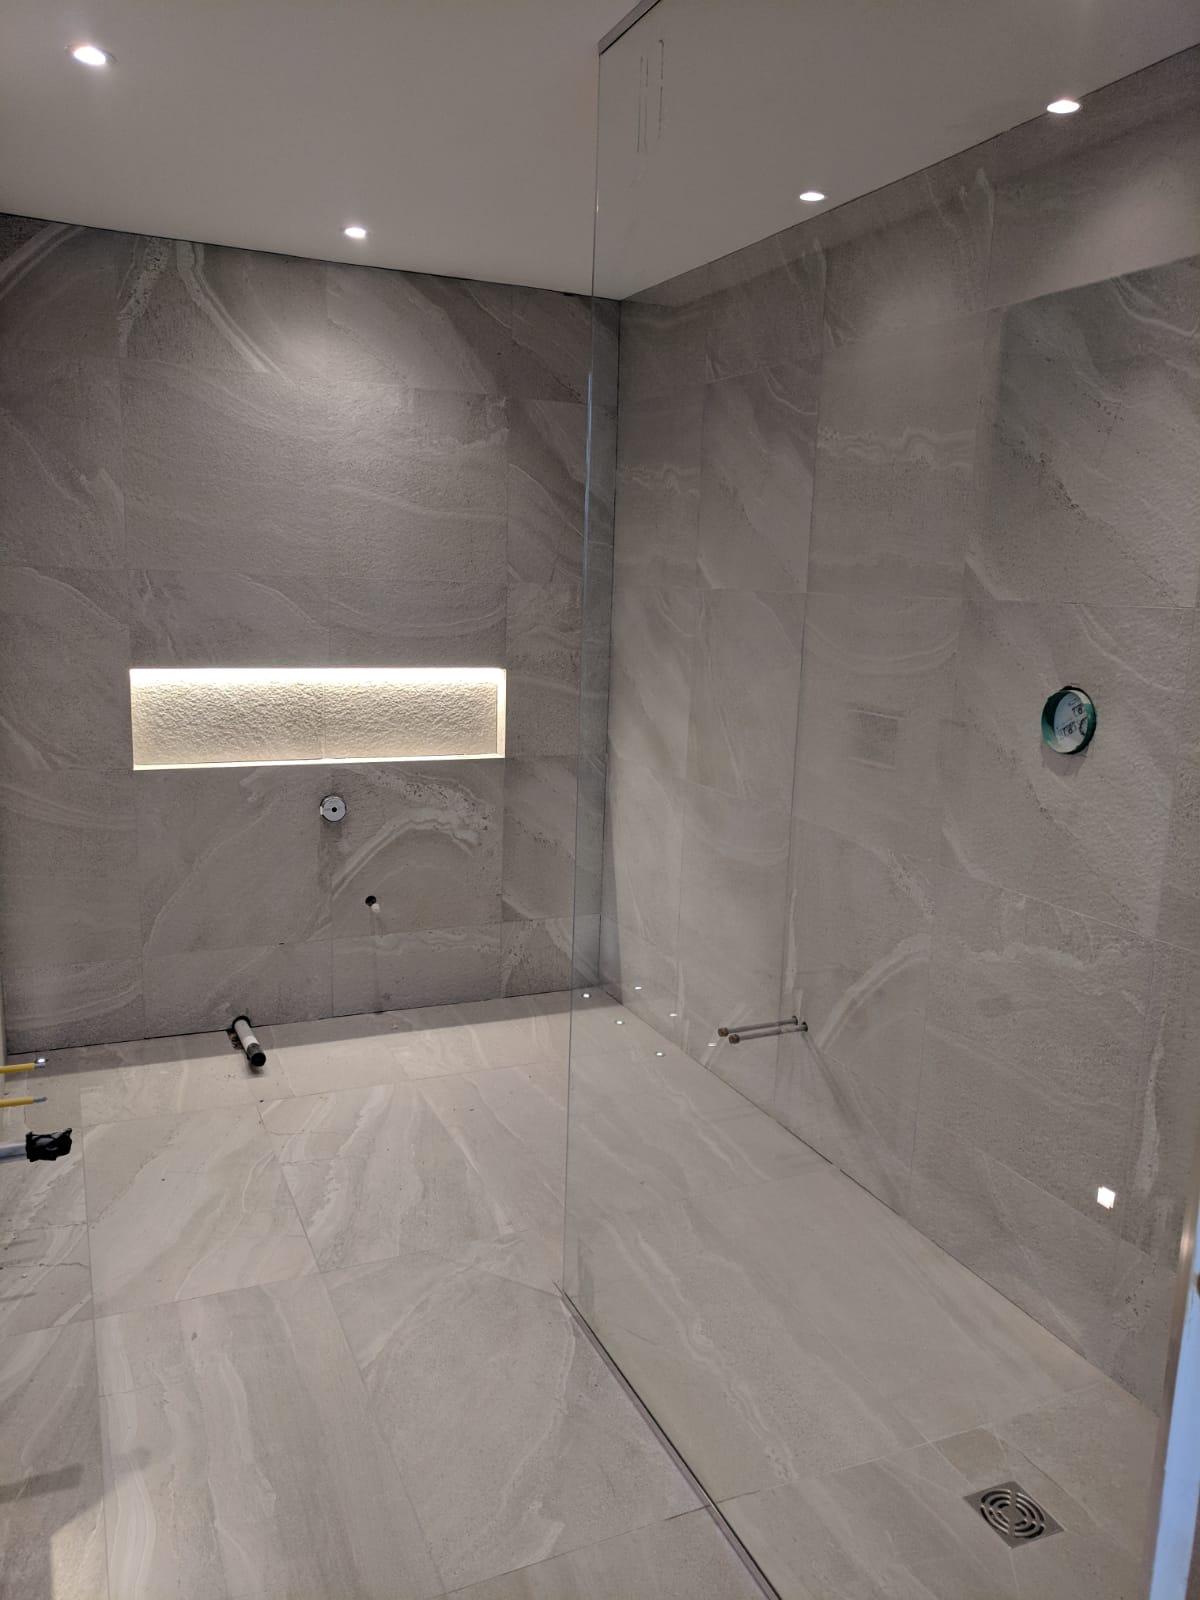 Large format shower screens